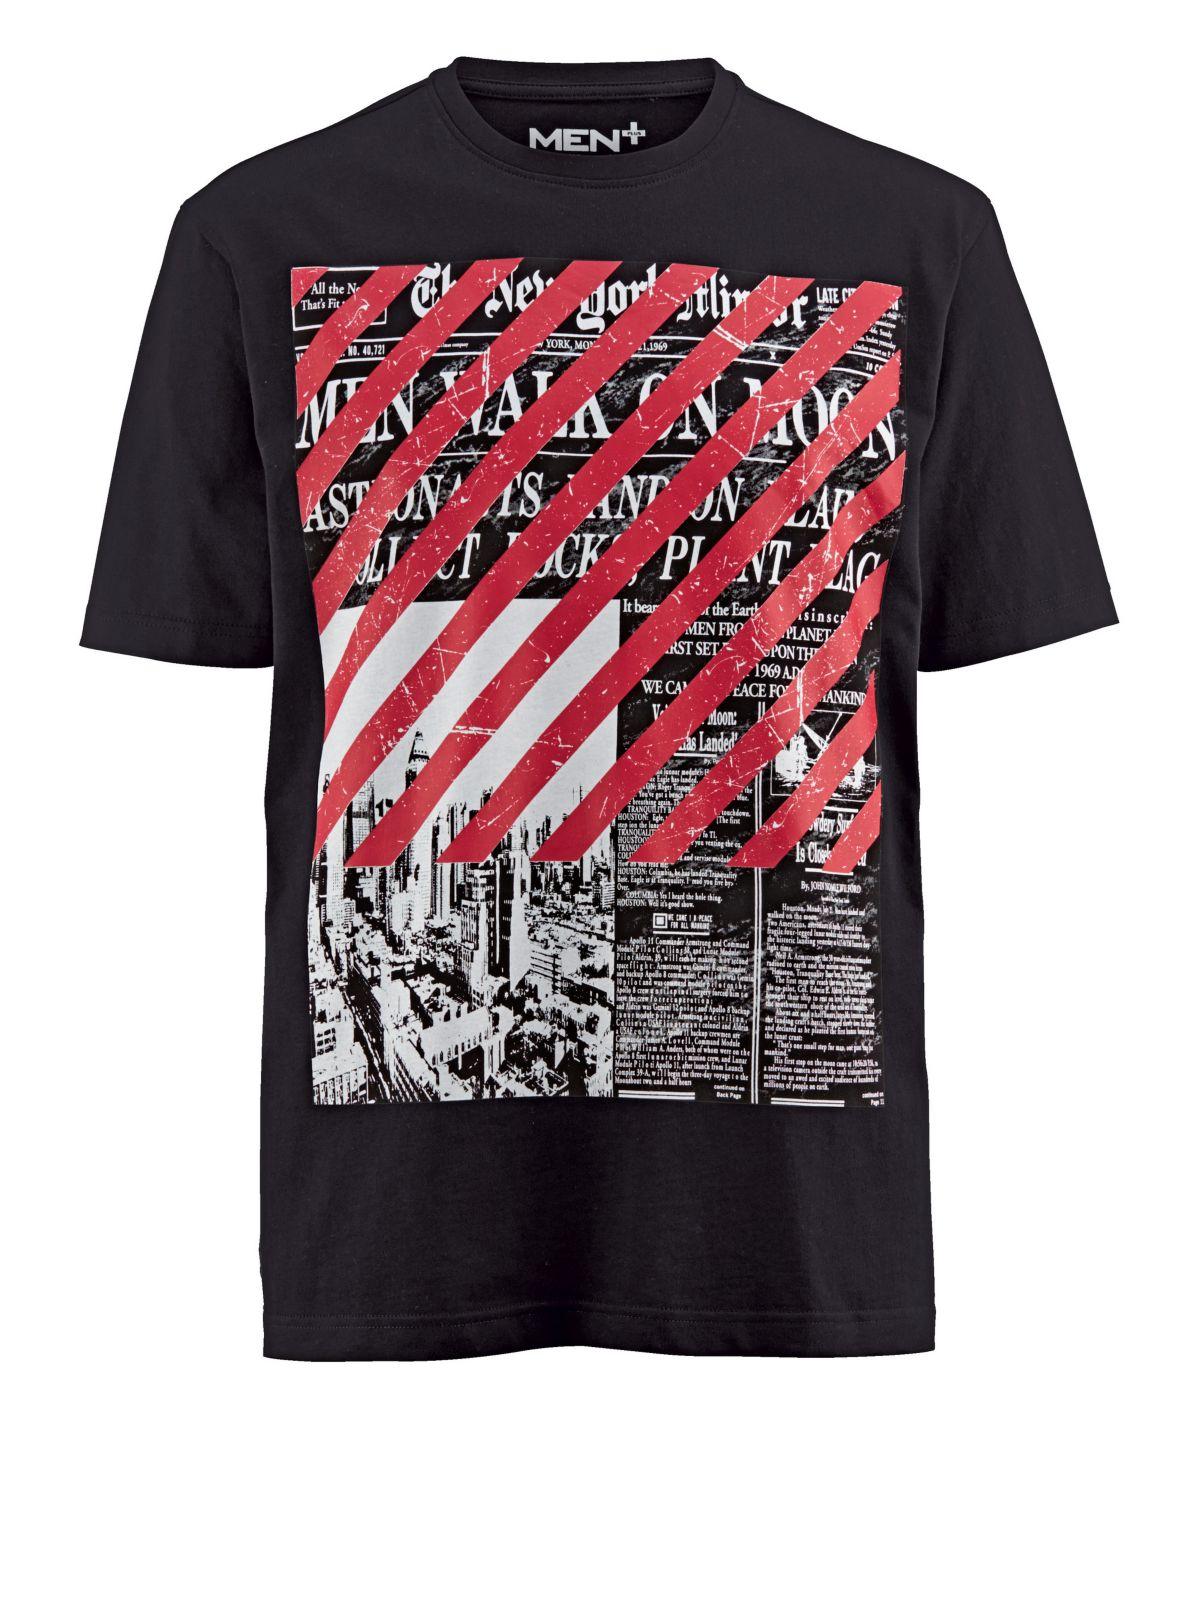 Men Plus by Happy Size T-Shirt mit Frontprint